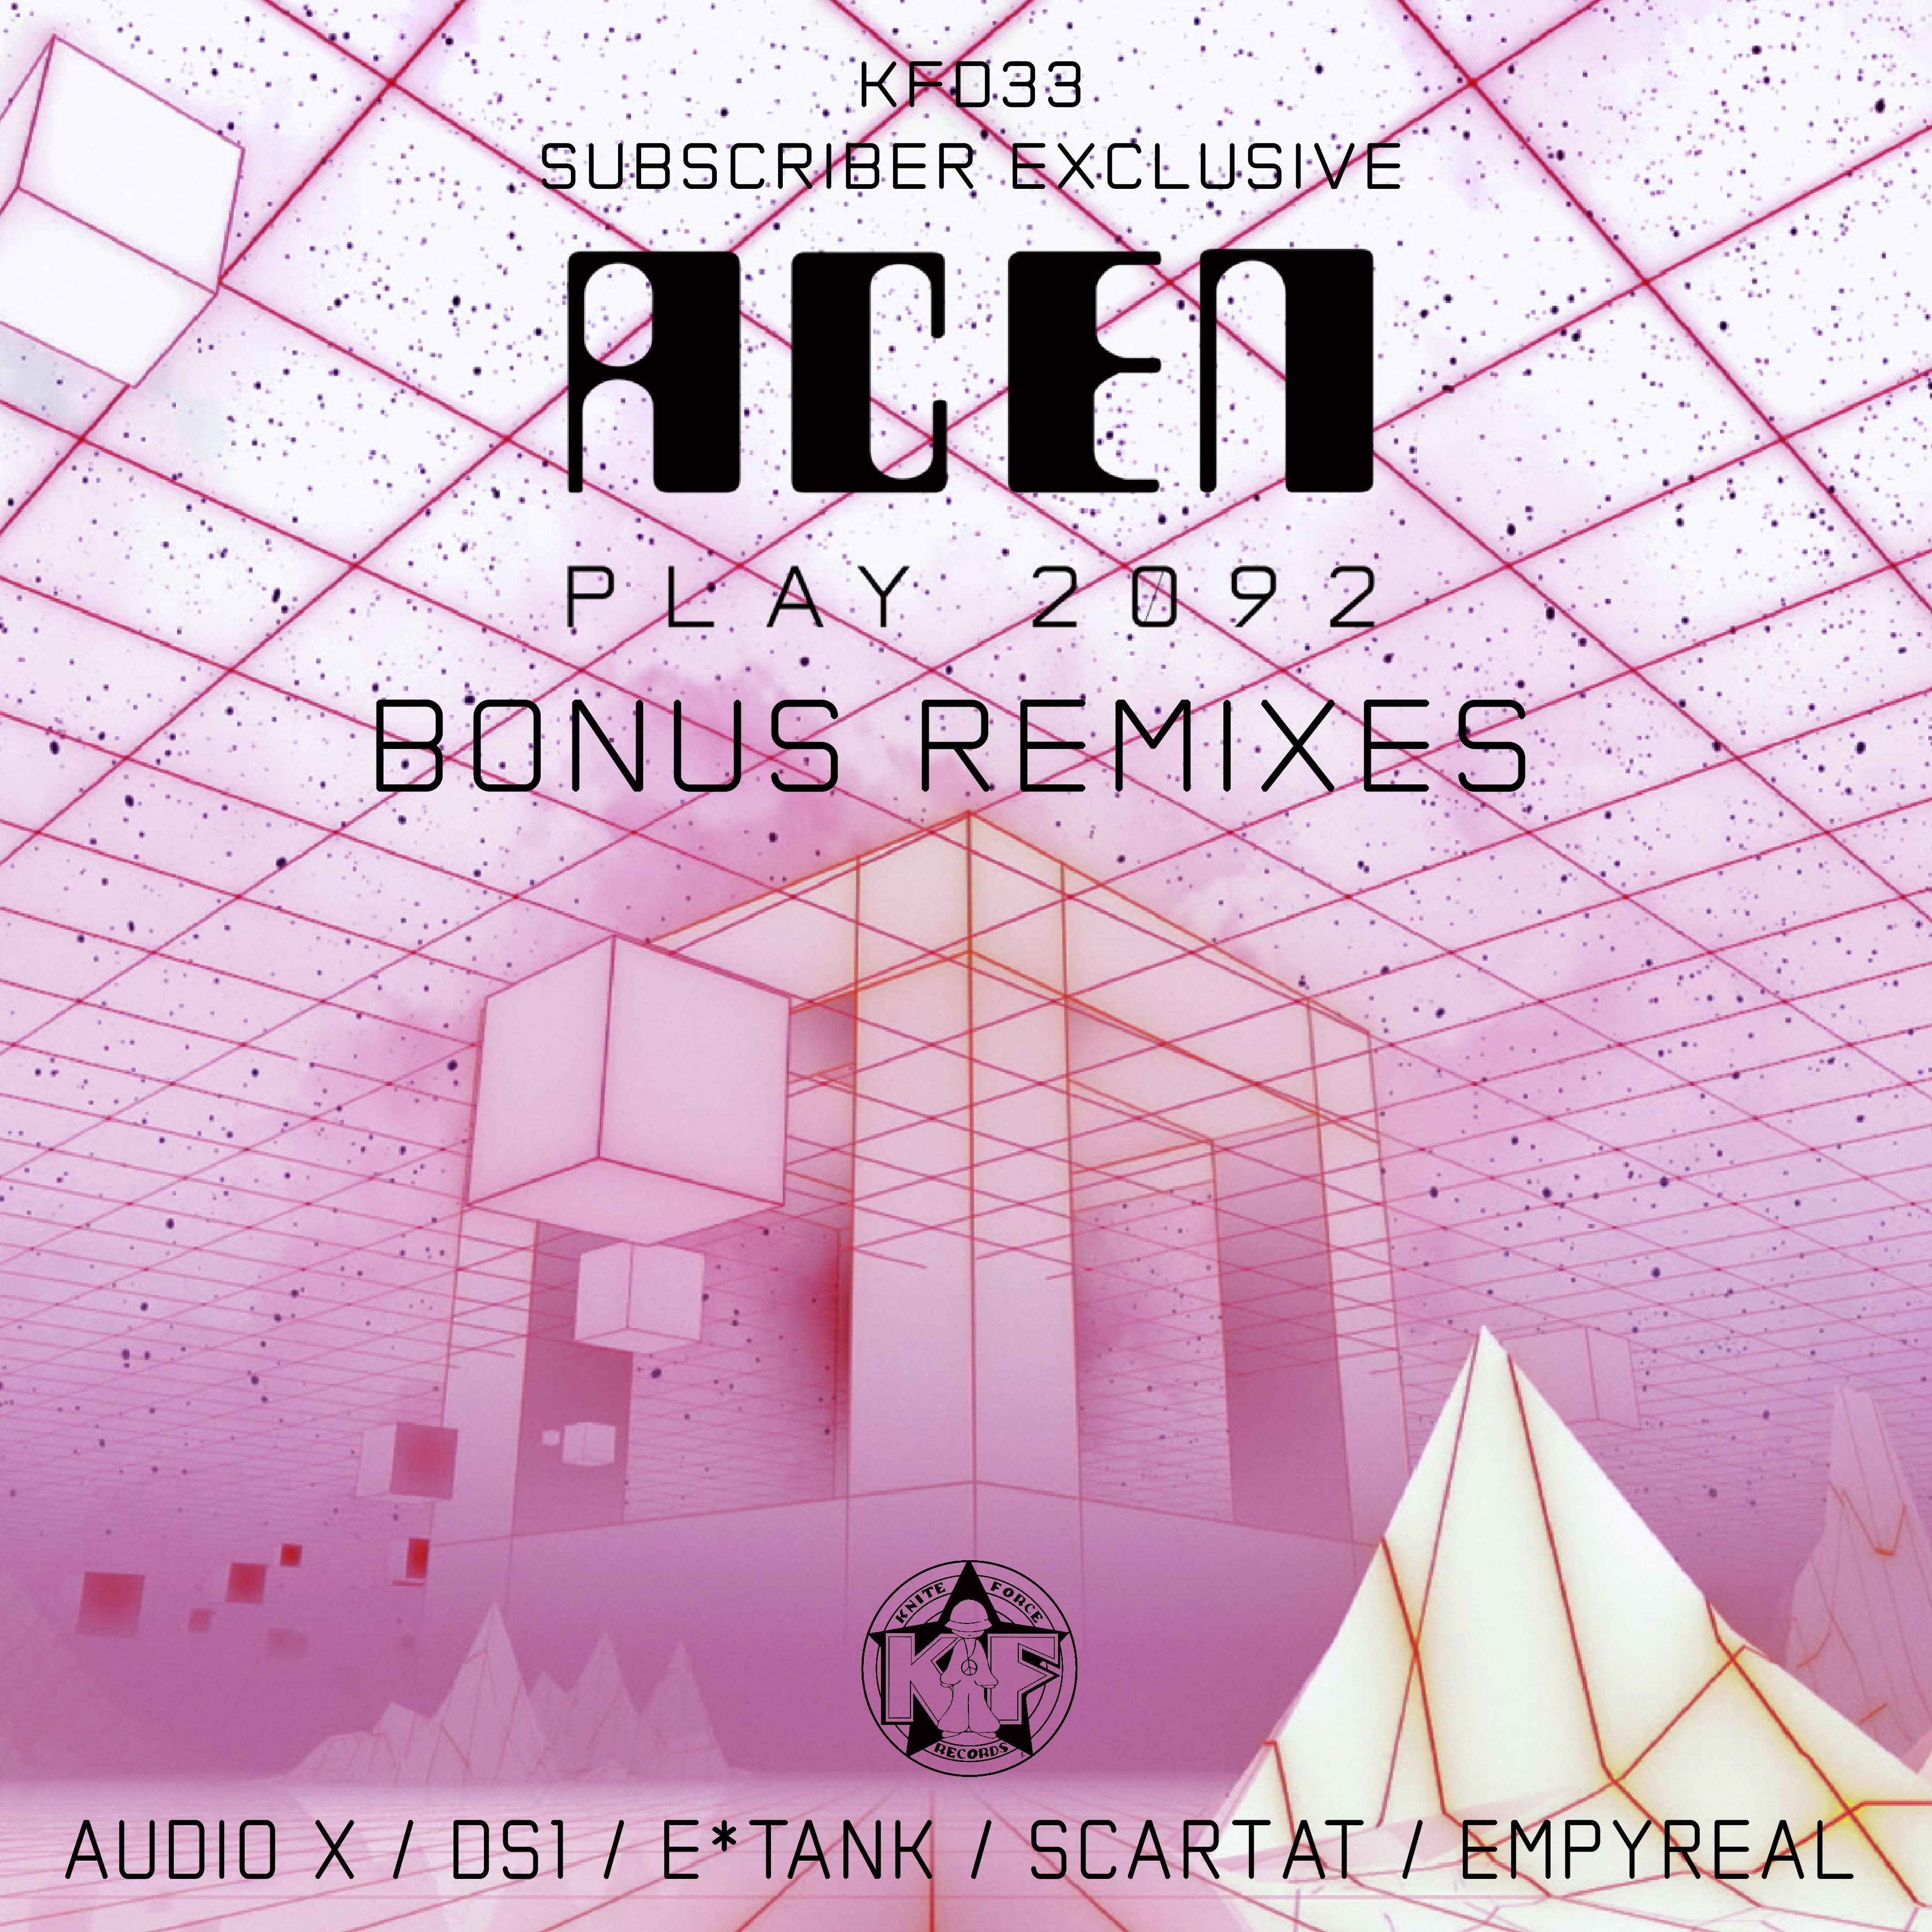 [KFD033] Acen - Play 2092 - VIP Exclusive Remixes EP (Digital Only)